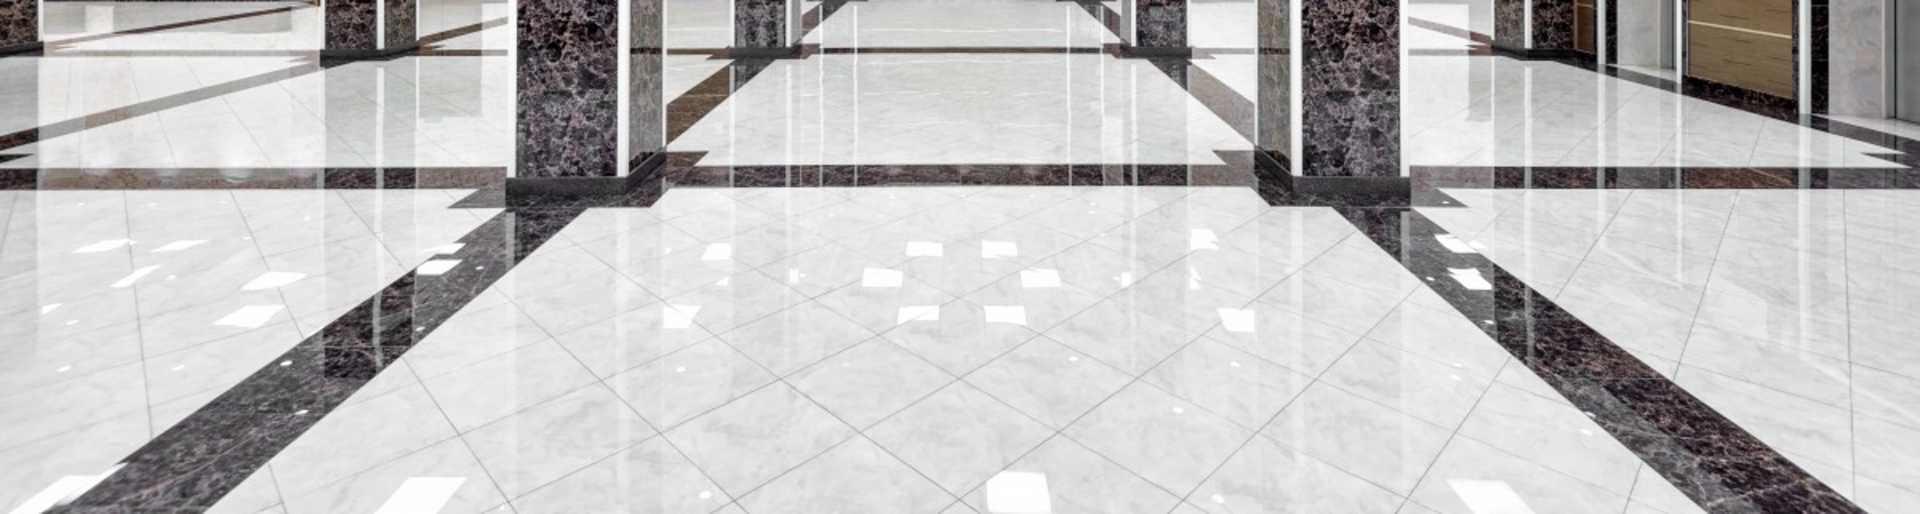 A shiny polyaspartic floor installed by OGI   Polyaspartic vs. epoxy coatings